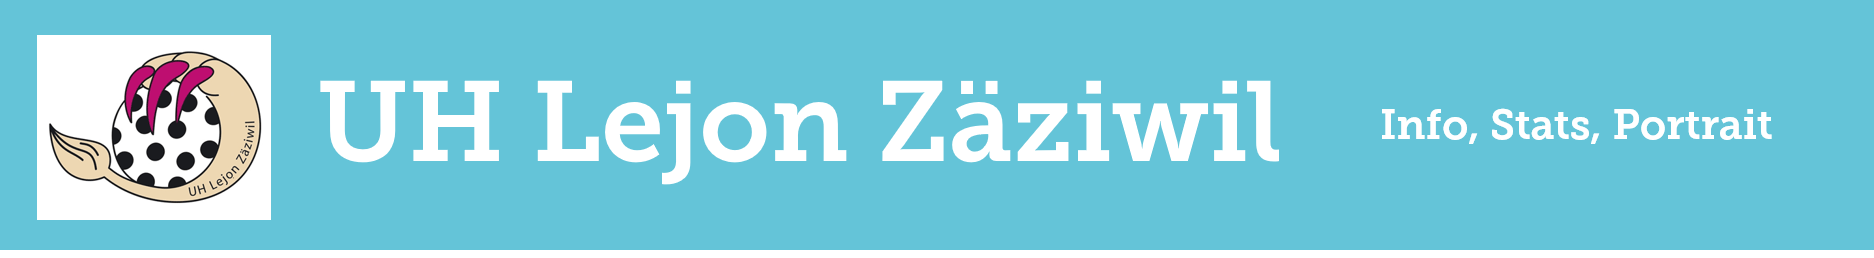 UH Lejon Zäziwil.png